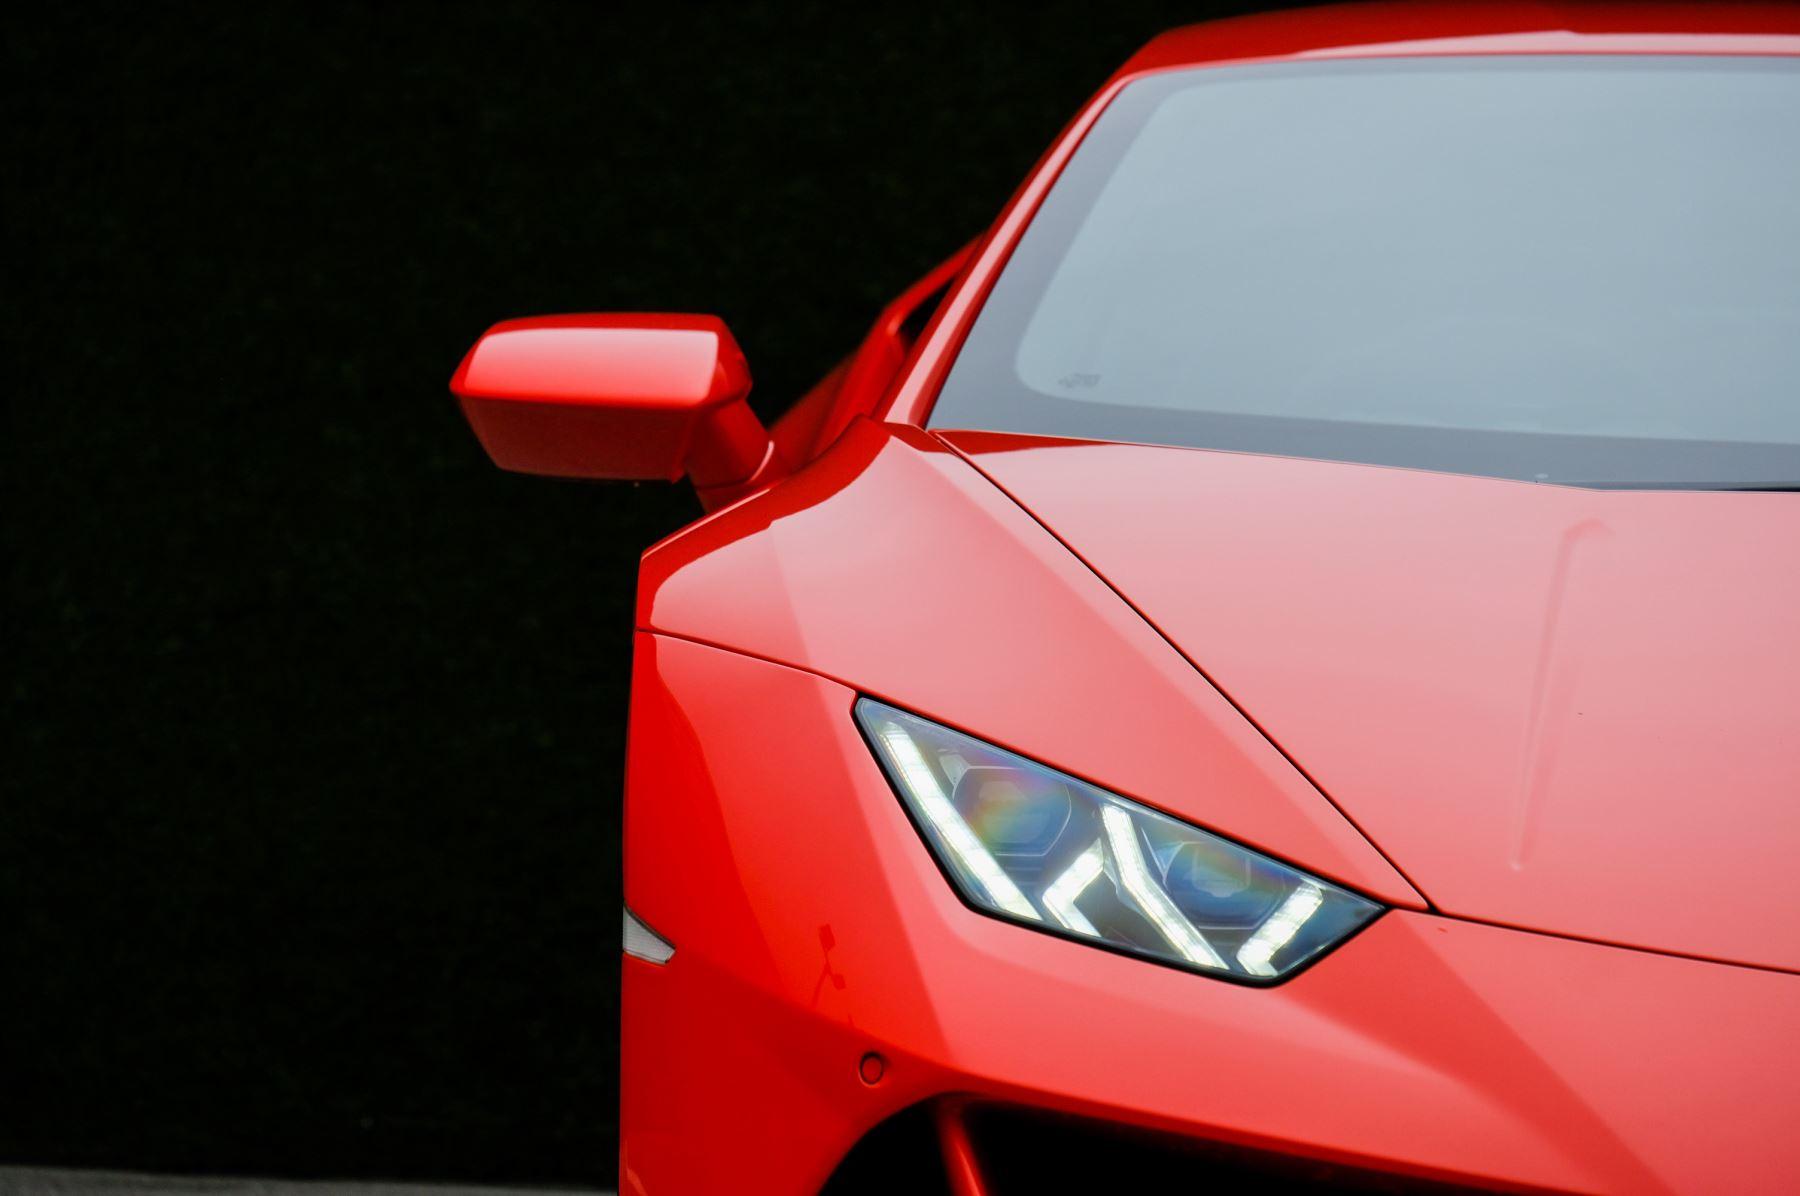 Lamborghini Huracan EVO LP 640-4 LDF image 10